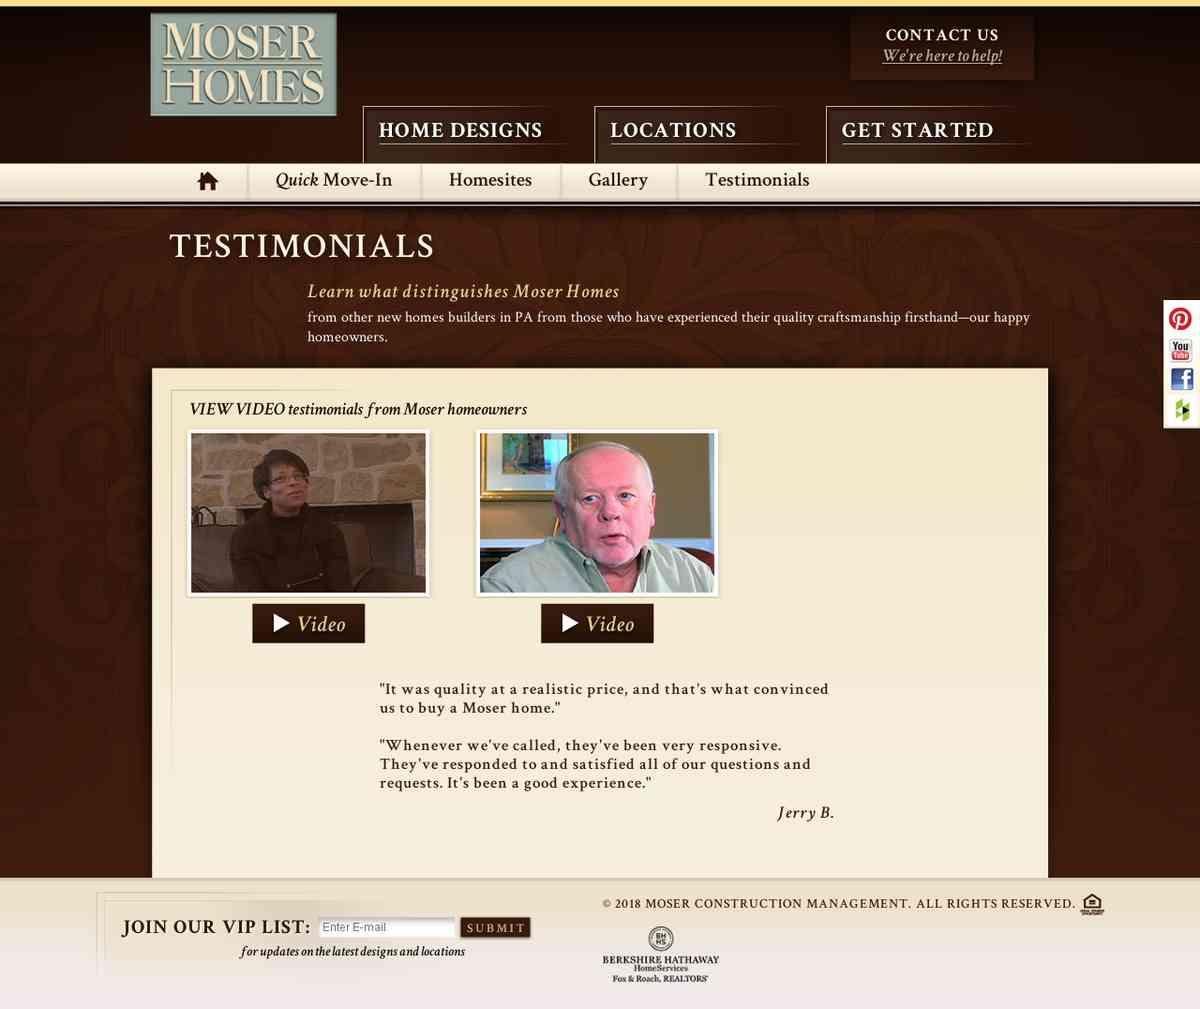 http://www.moserhomes.com/testimonials.php